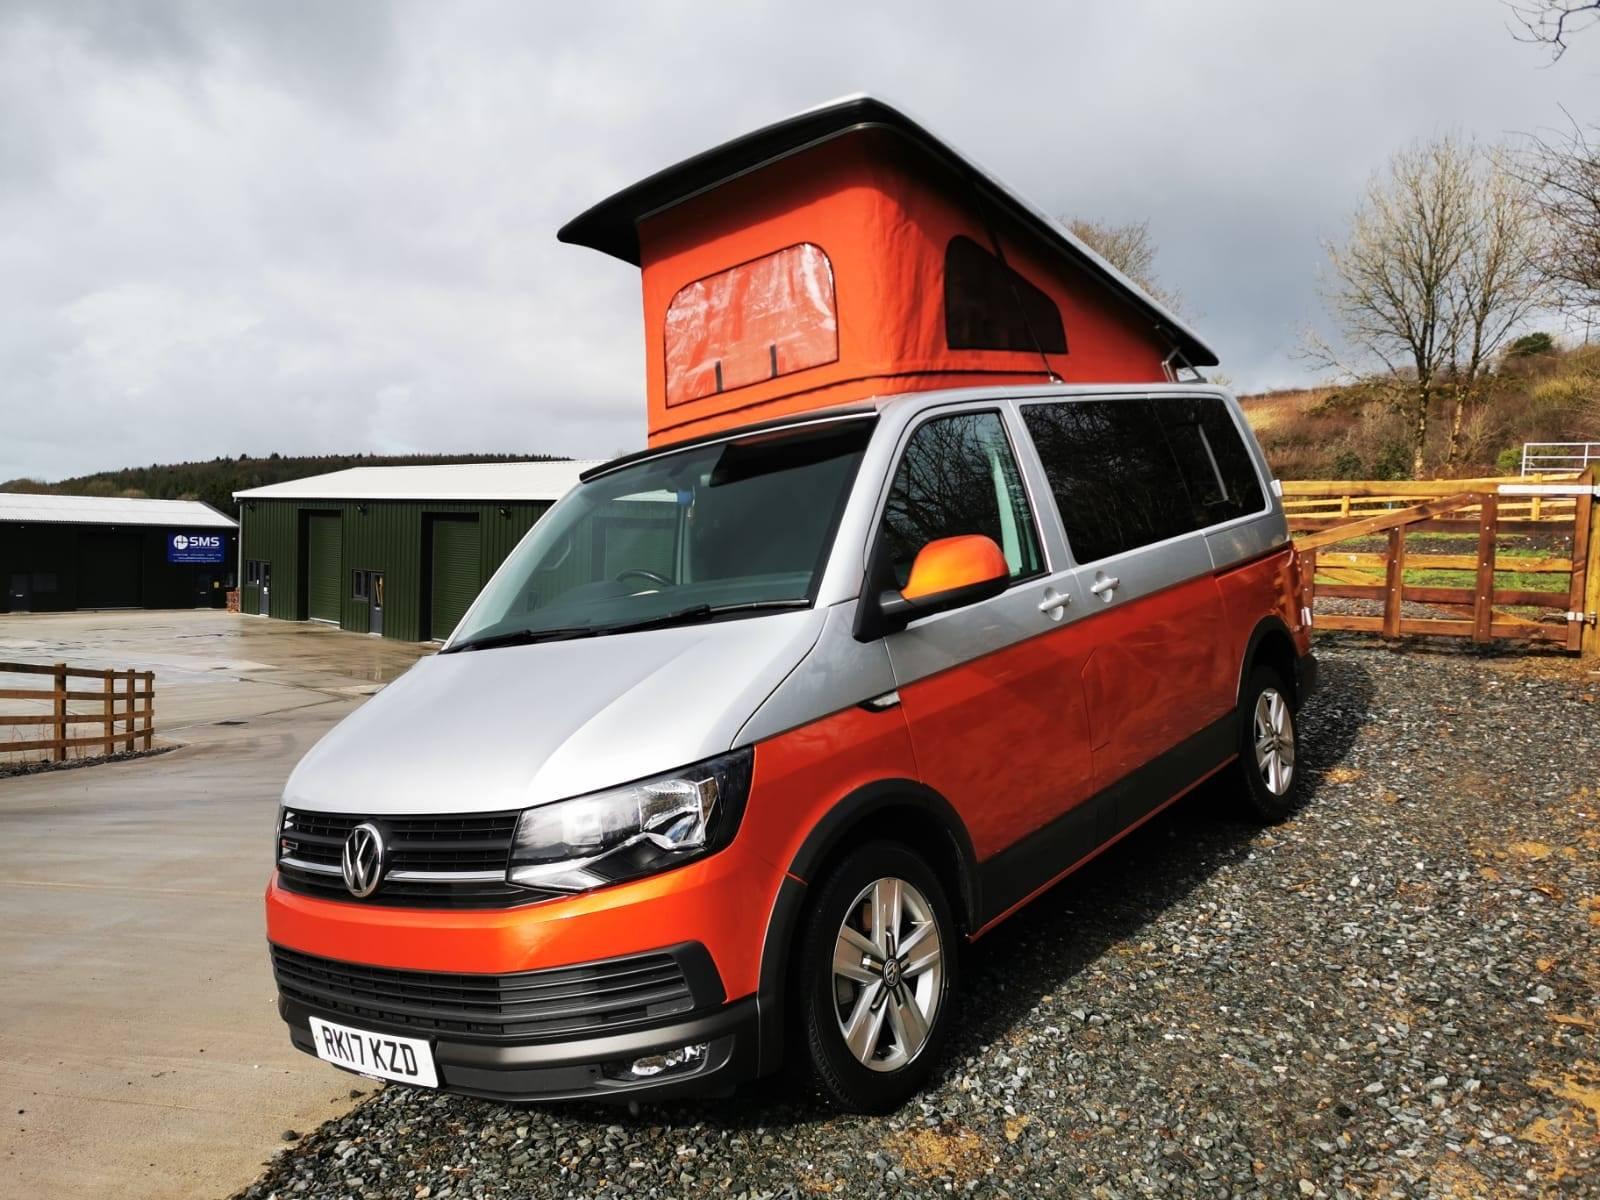 orange and silver VW campervan conversion